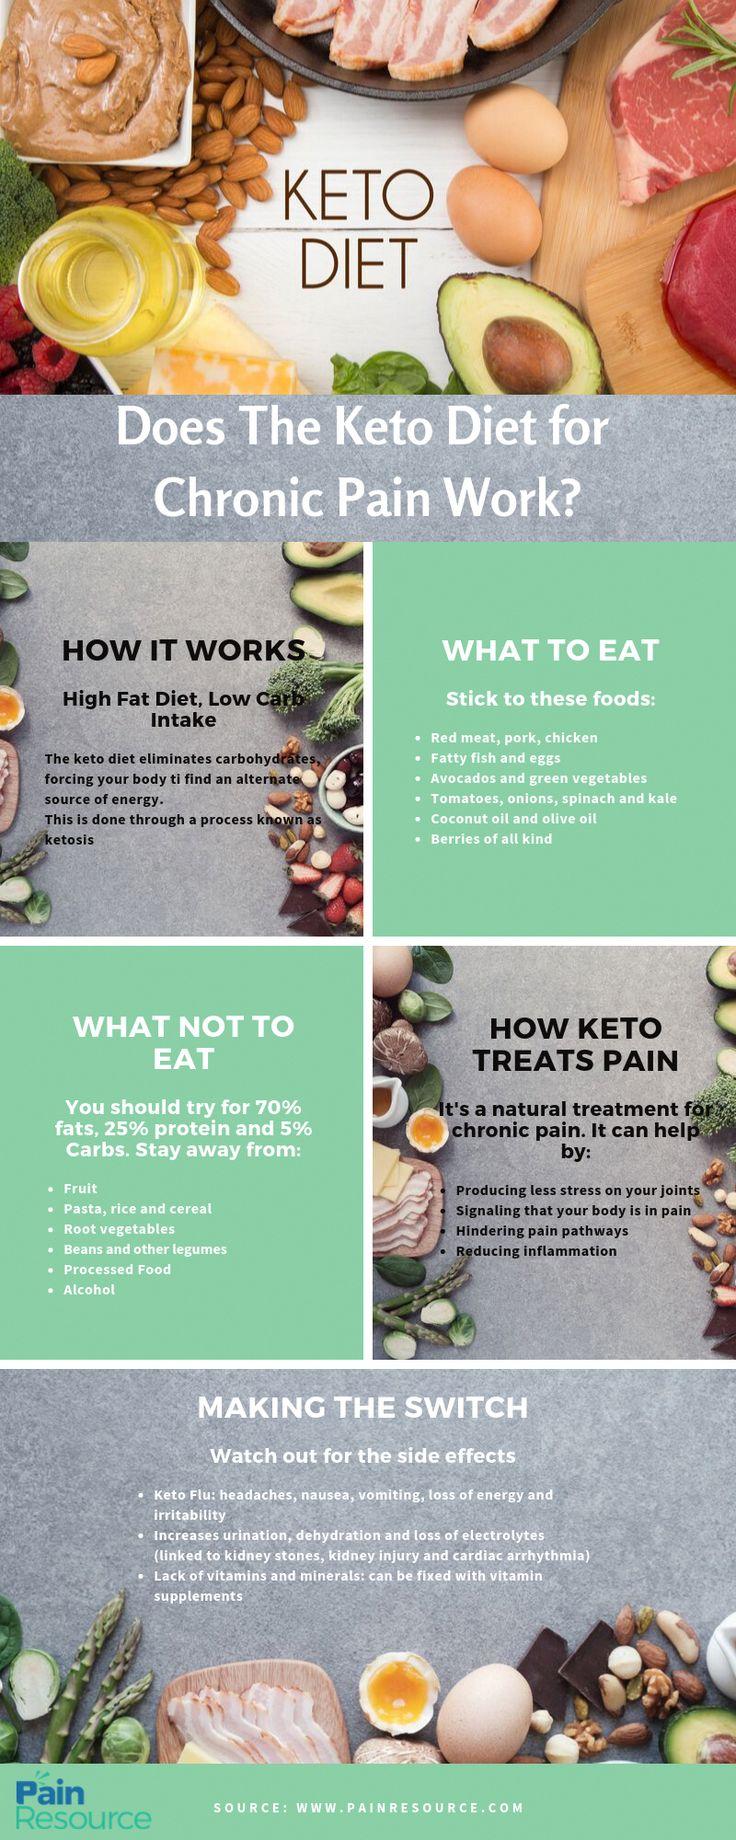 keto diet and chronic pain